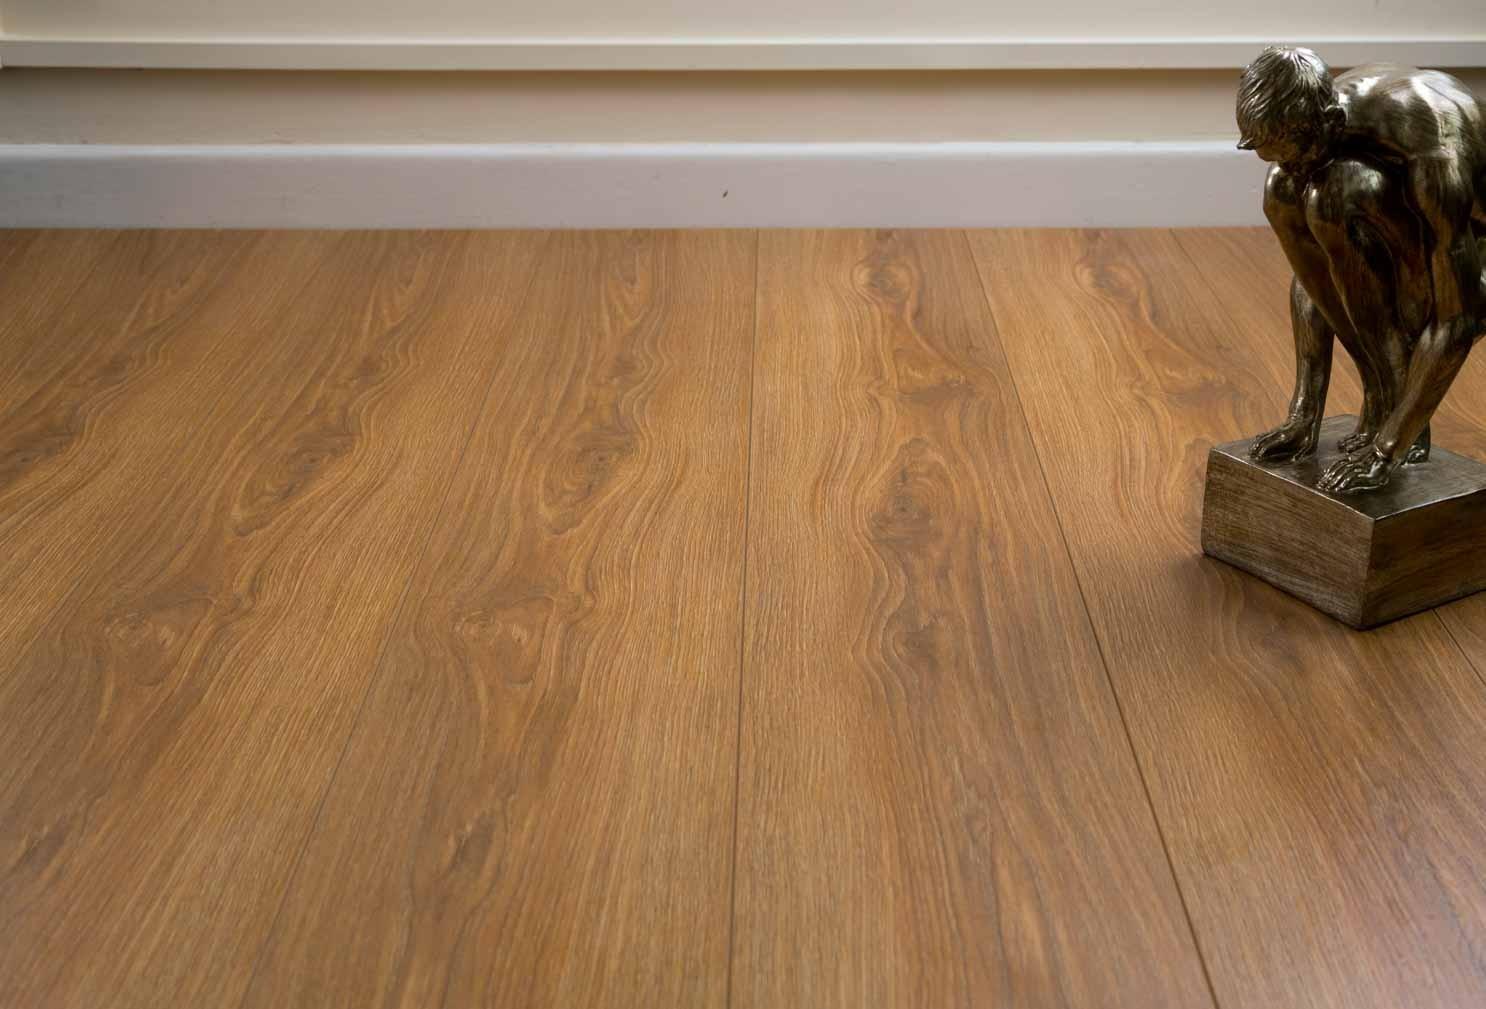 laminates floor burnbury 12mm french oak laminate flooring GWOTRCN